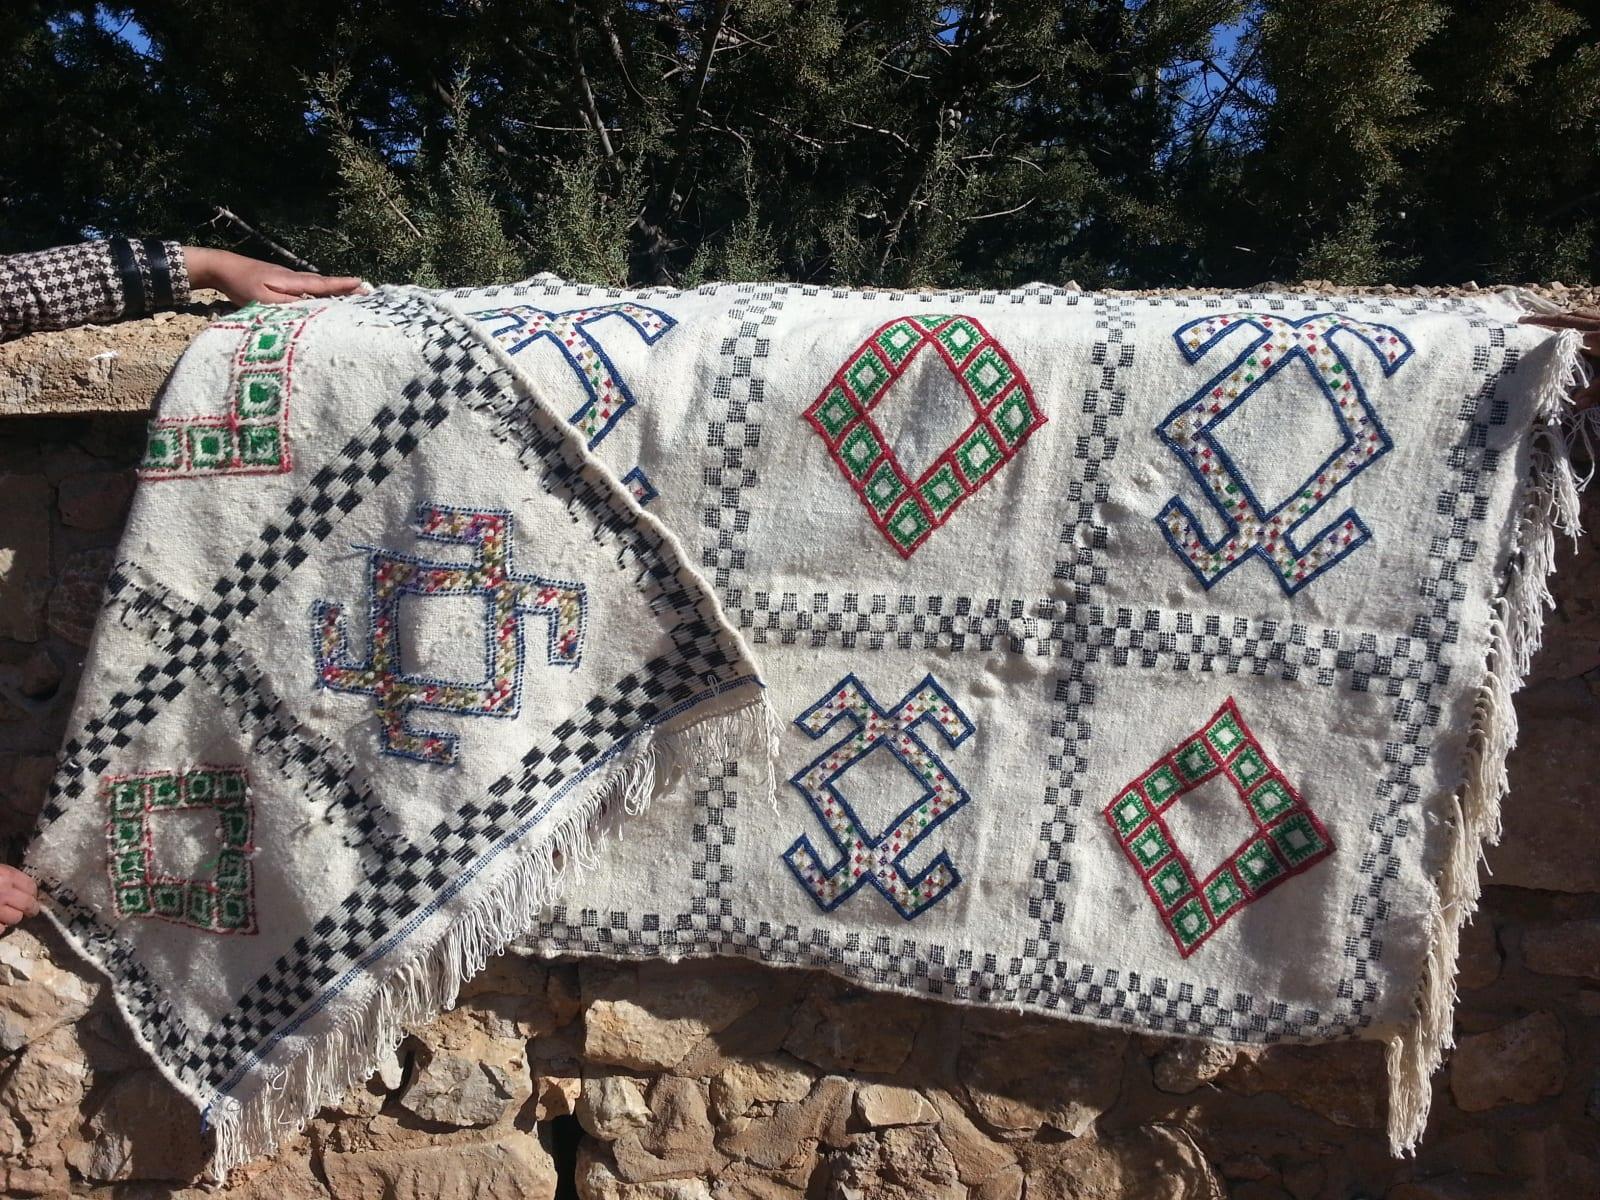 Hanbel Almabroum and Sda Colored Morocco